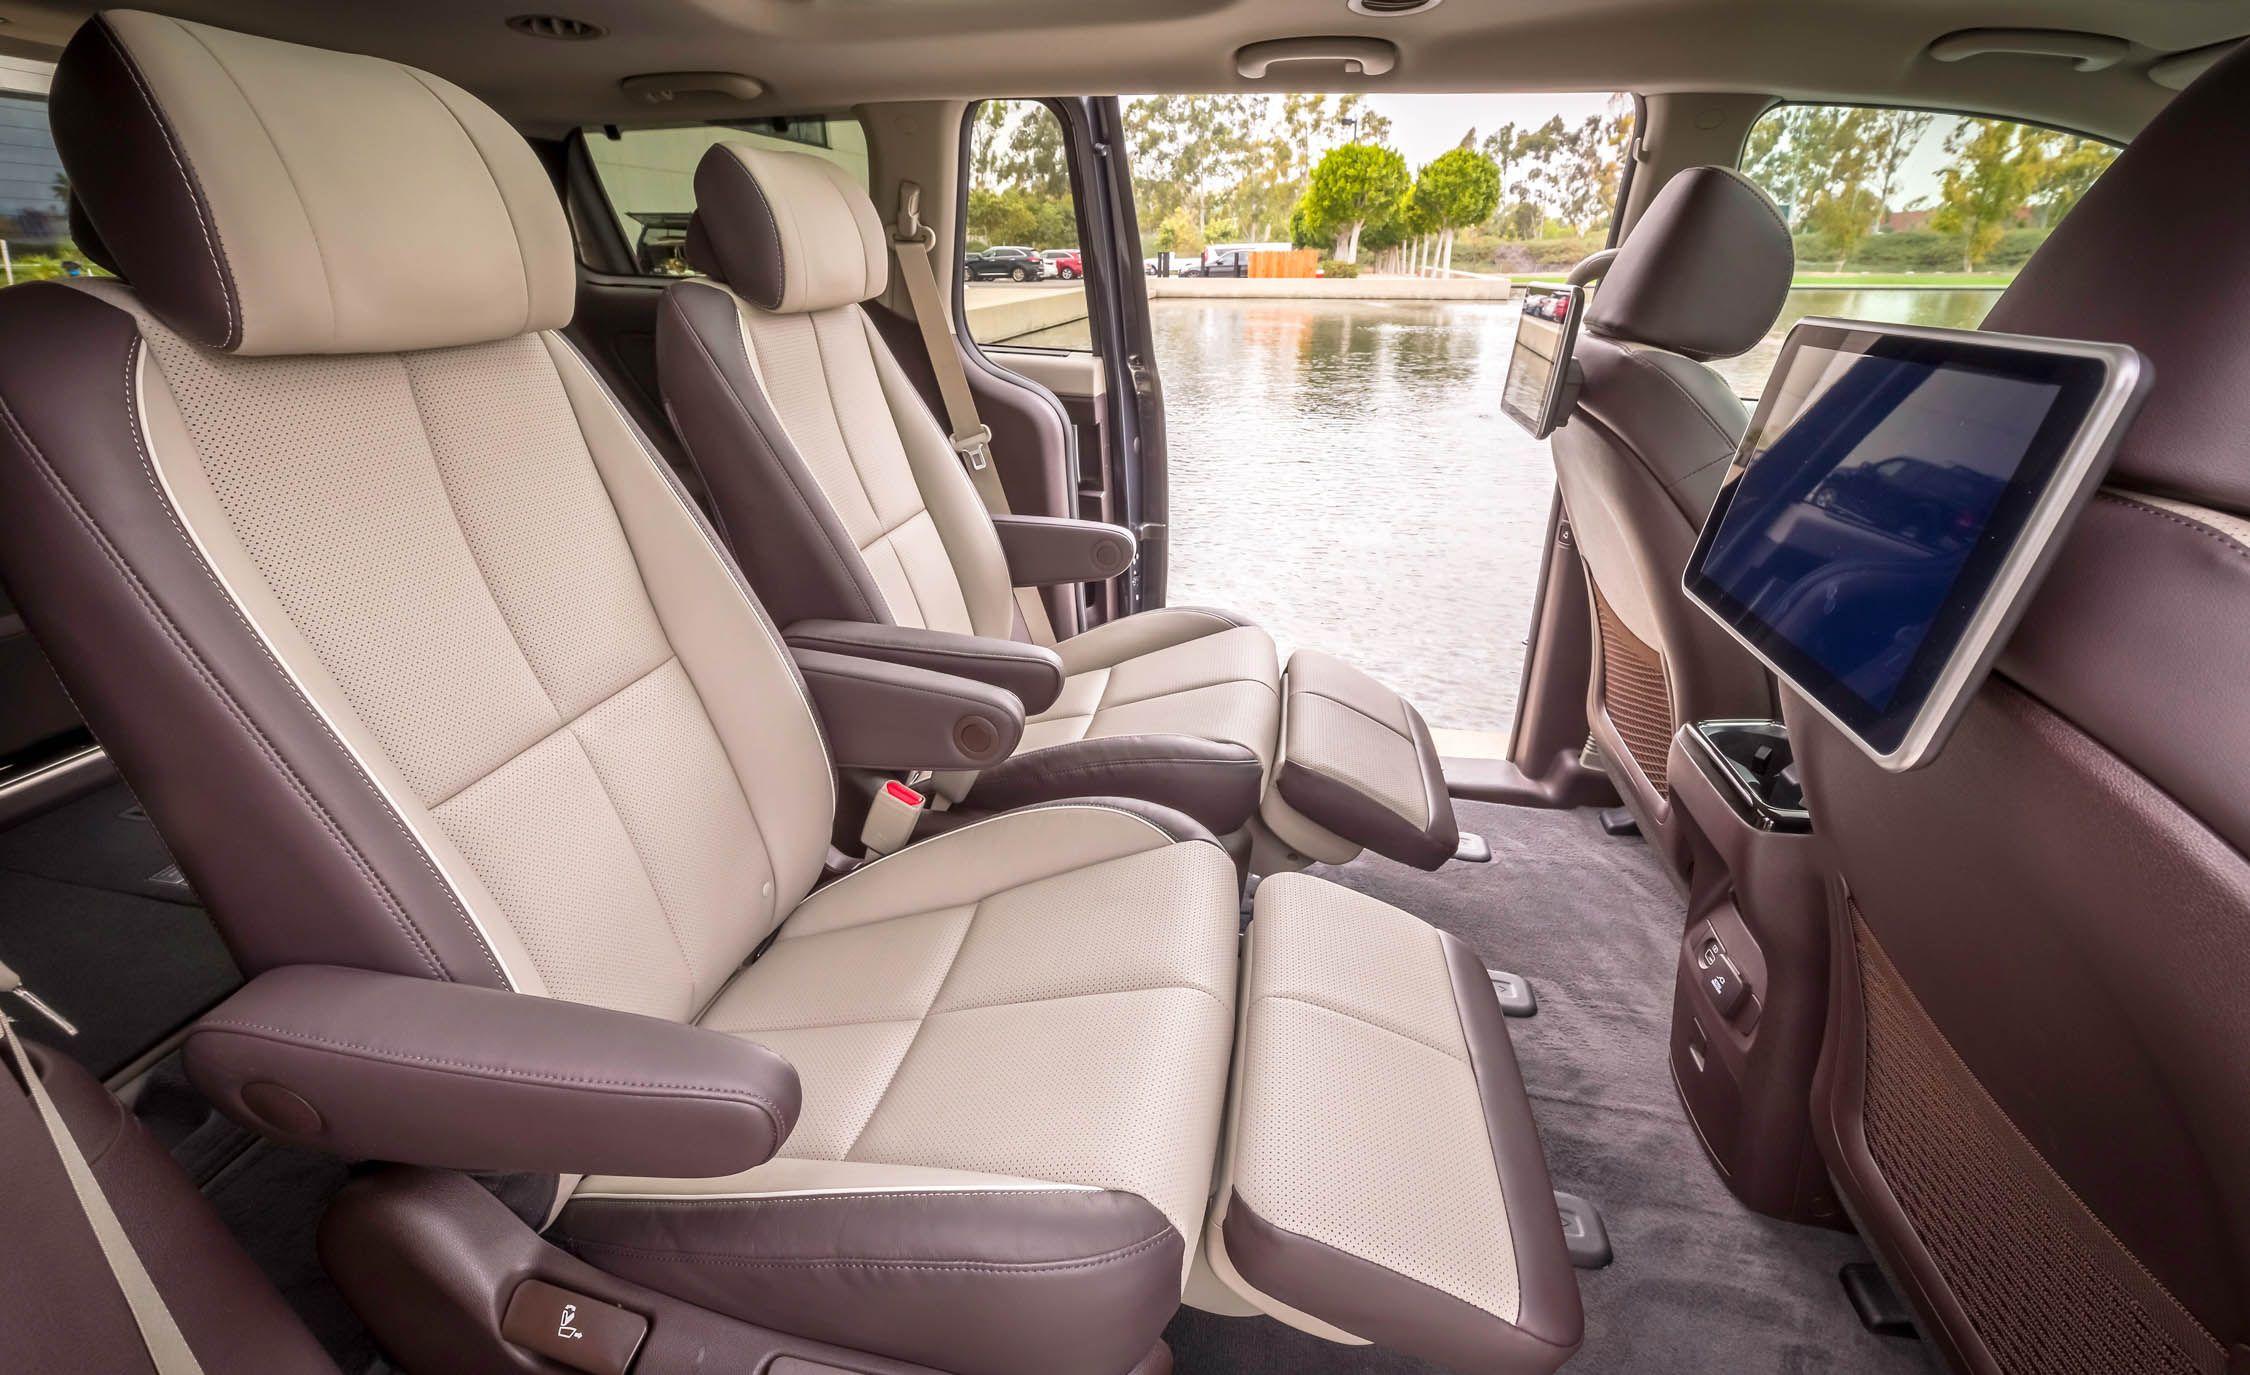 Kia Sedona Reviews Price Photos And Specs Car Have A 2003 Ex My Power Windows No Longer Wor Driver